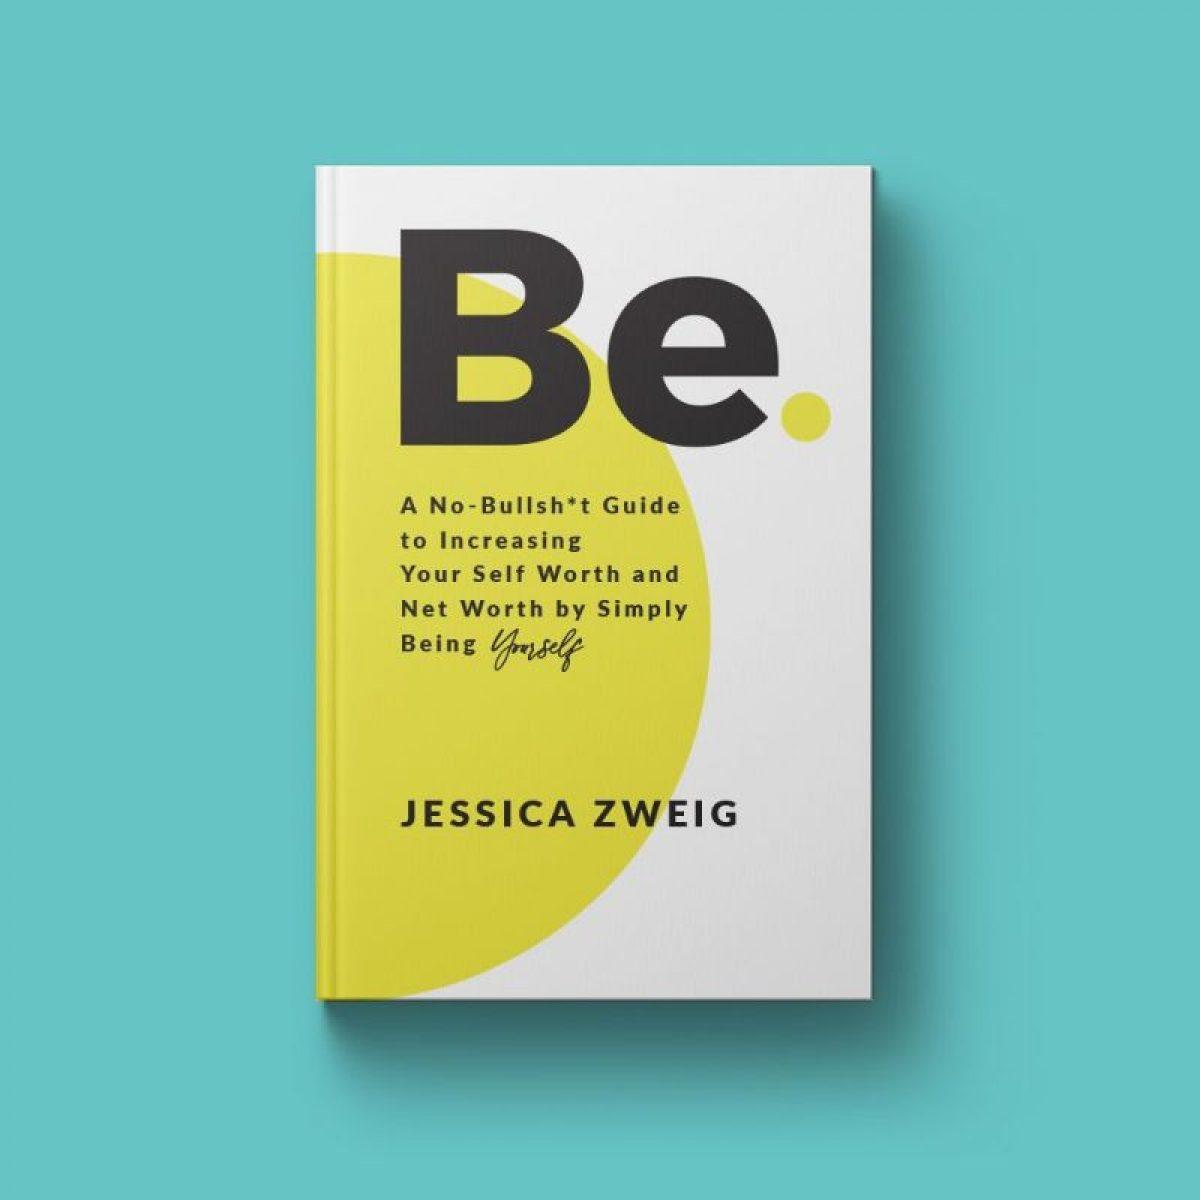 be-a-no-bullshit-guide-jessica-zweig-cover-art